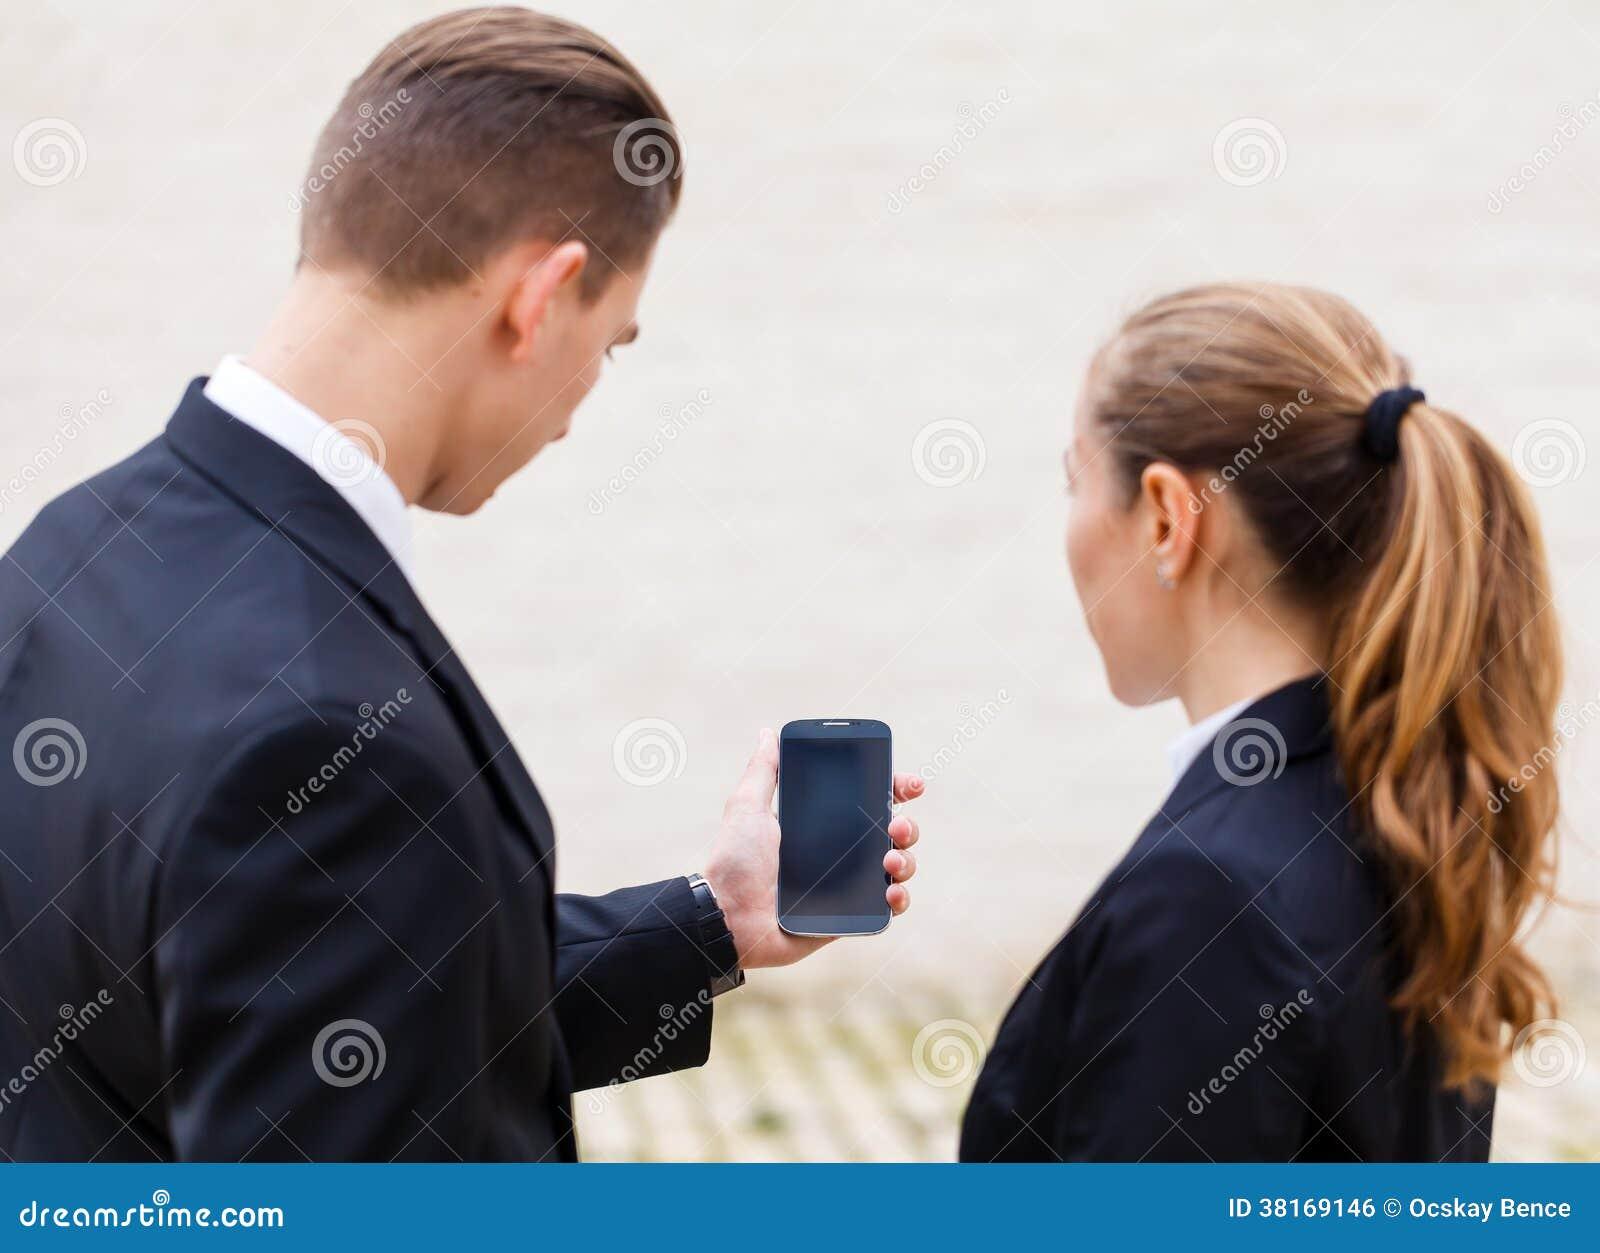 professional people meet